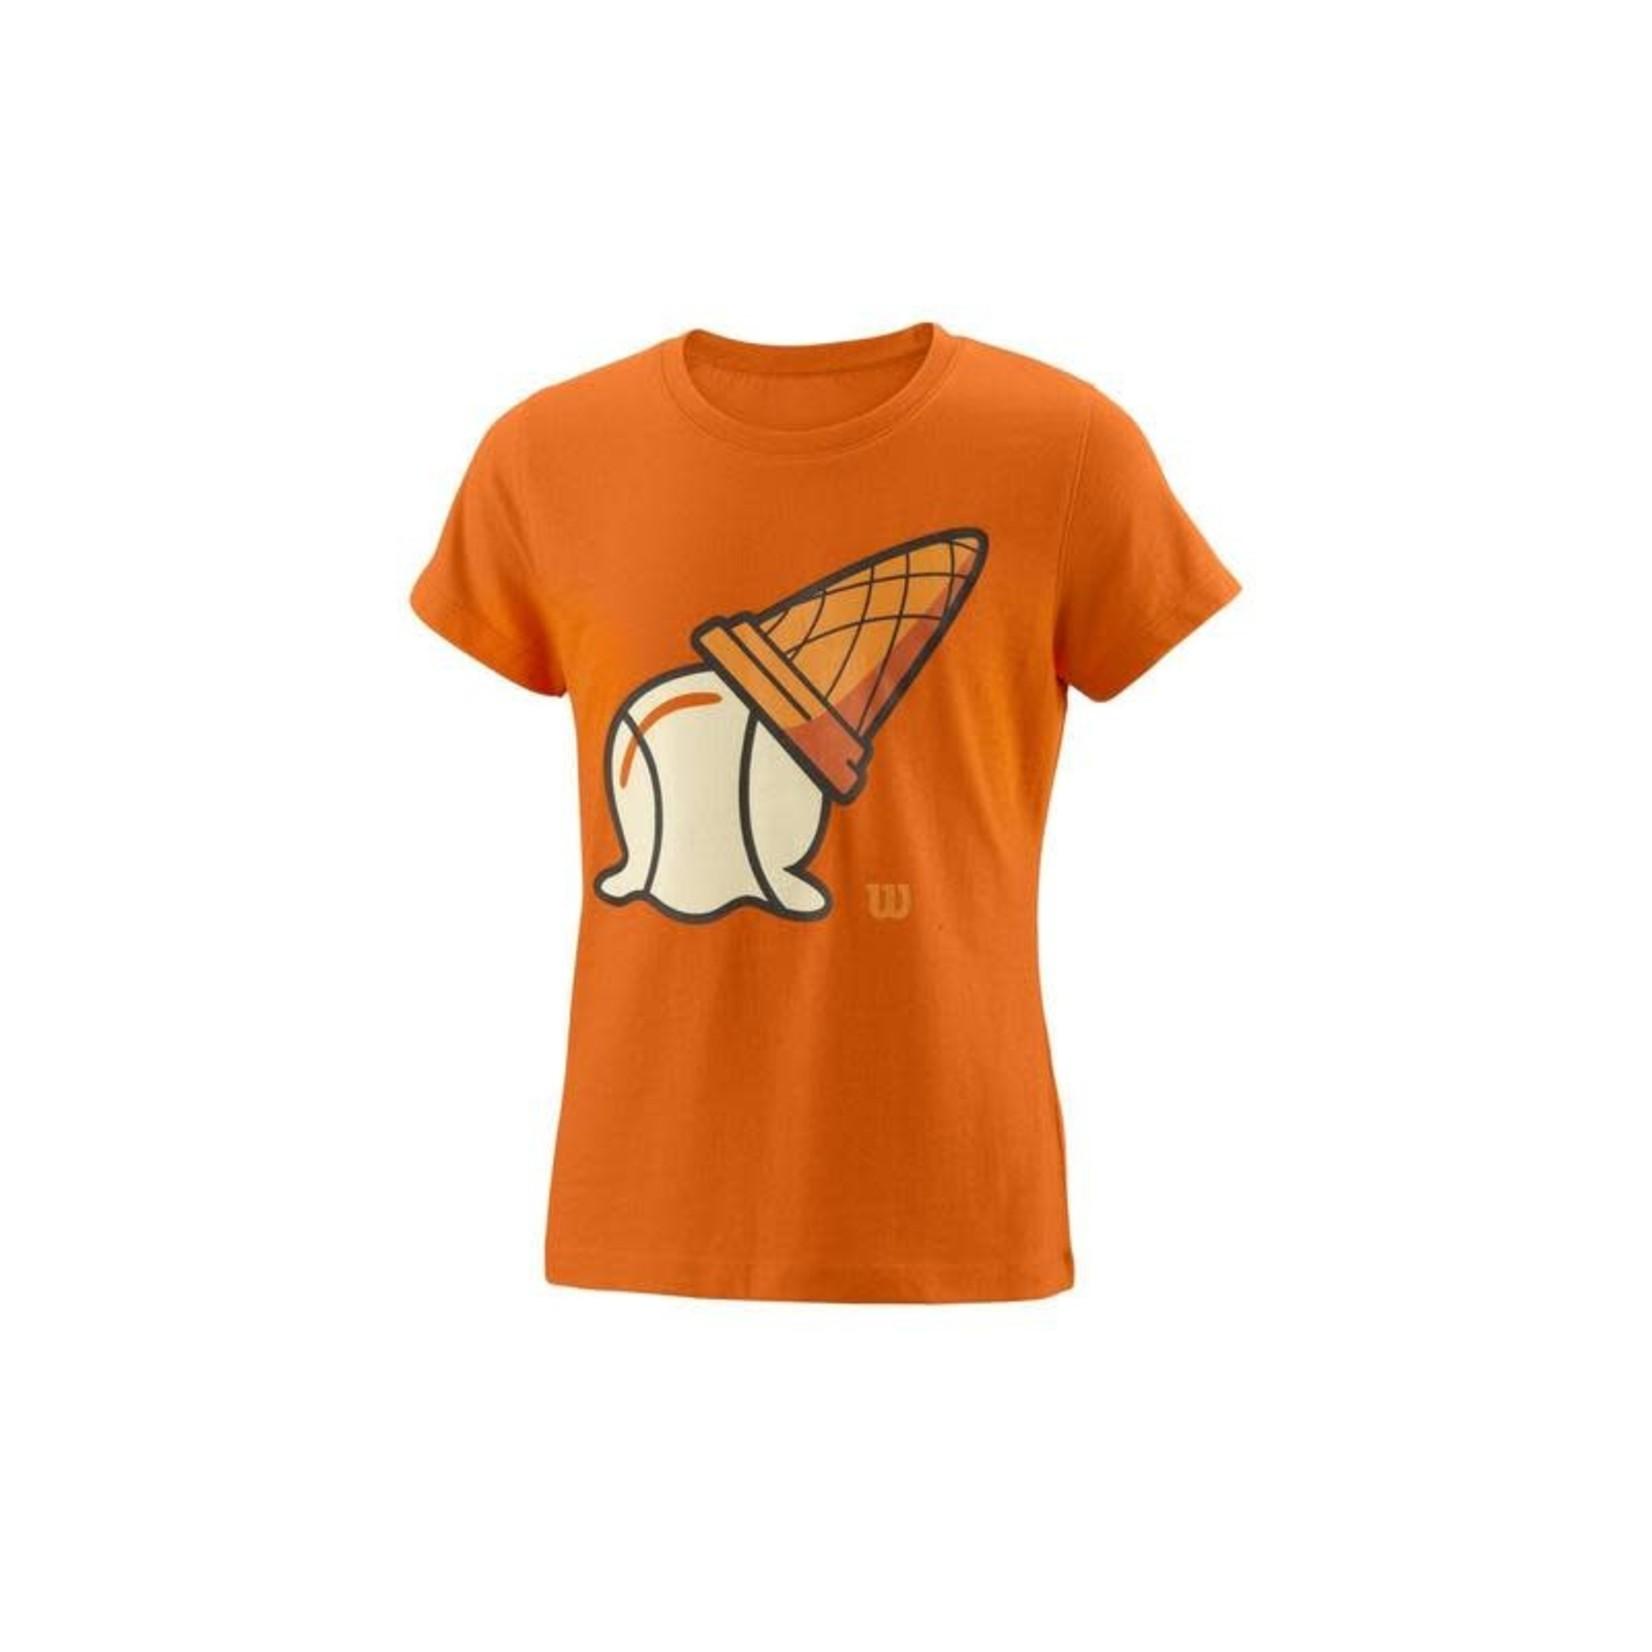 Wilson Meisjes - Inverted Cone Tech T-shirt